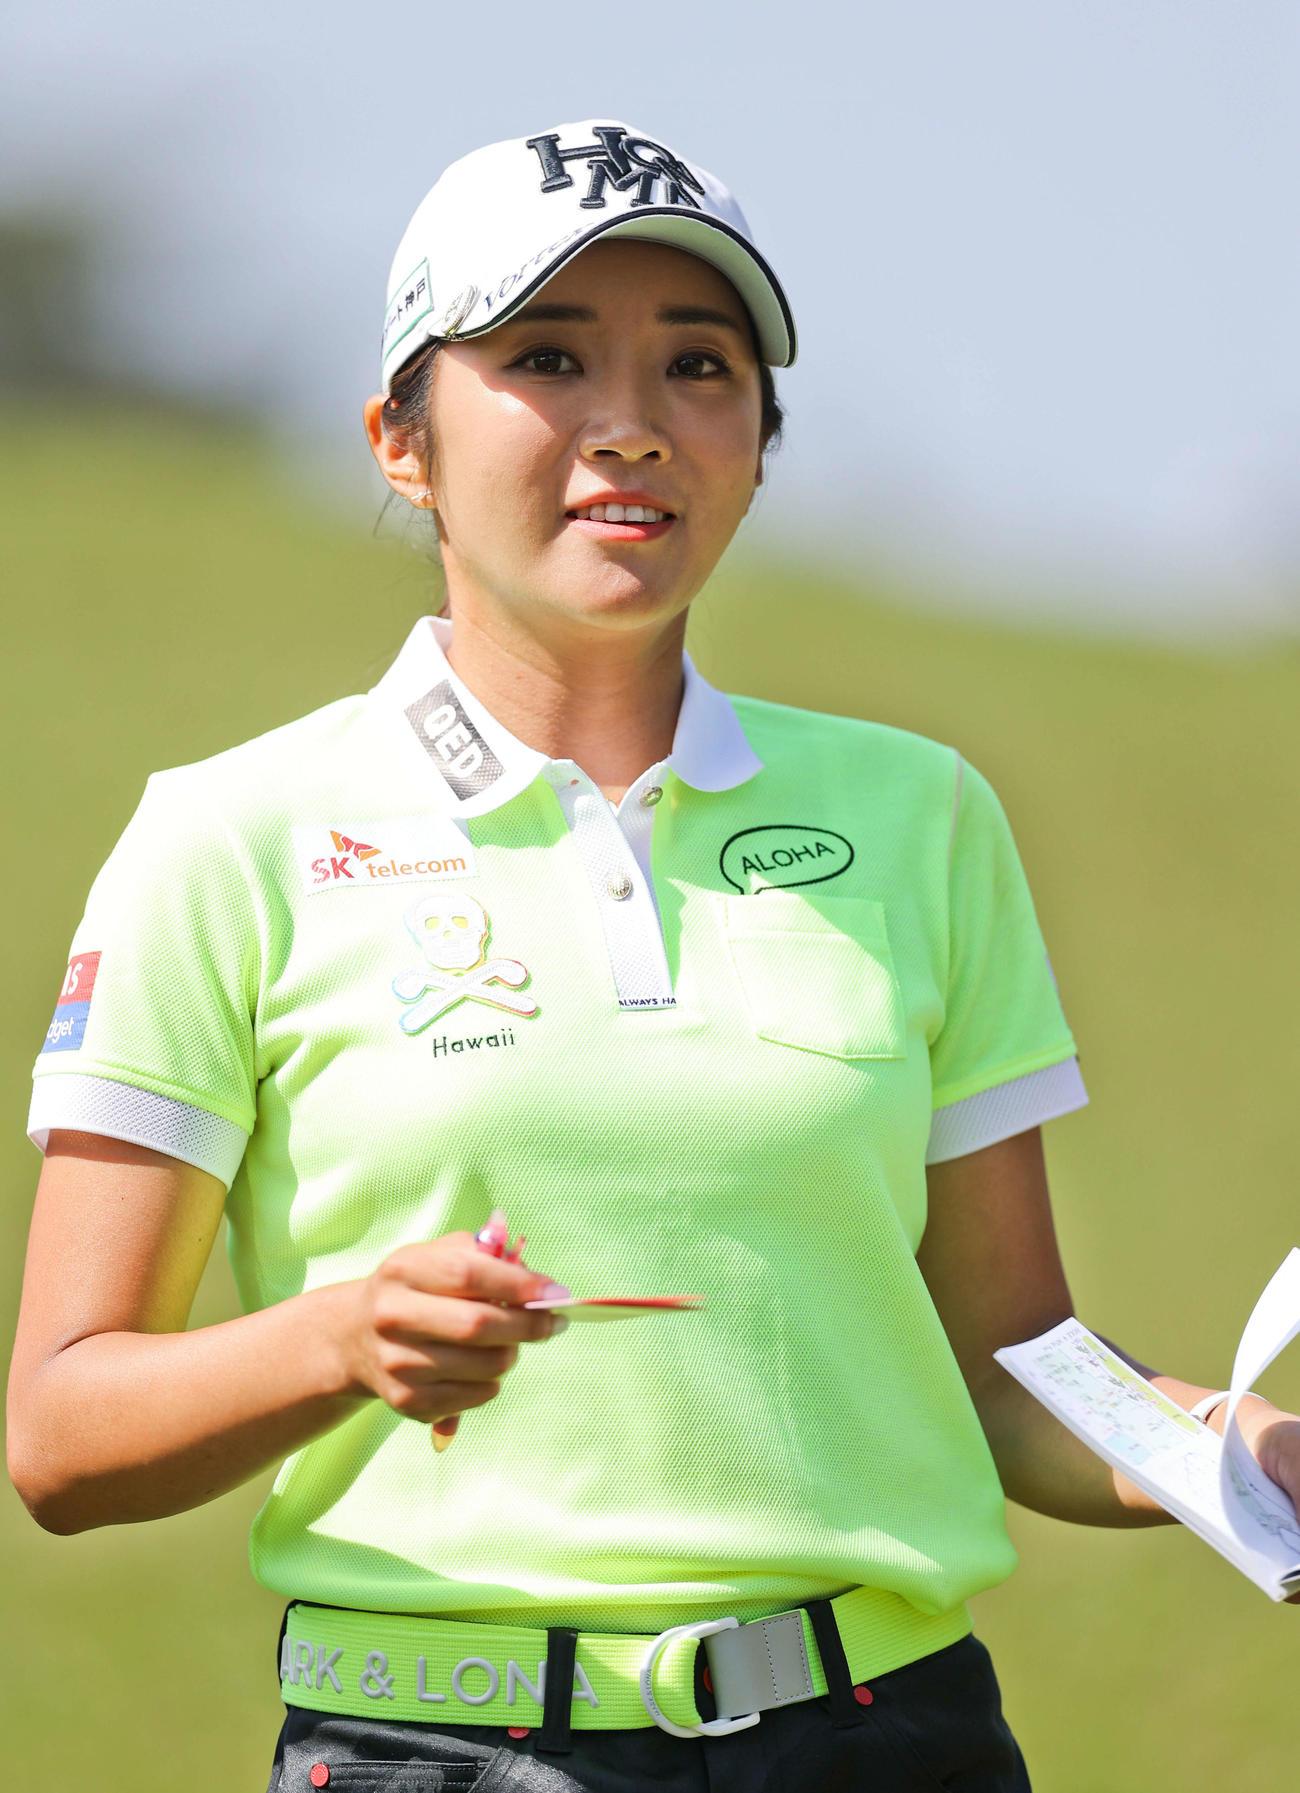 https://www.nikkansports.com/sports/golf/news/img/202105080000065-w1300_6.jpg